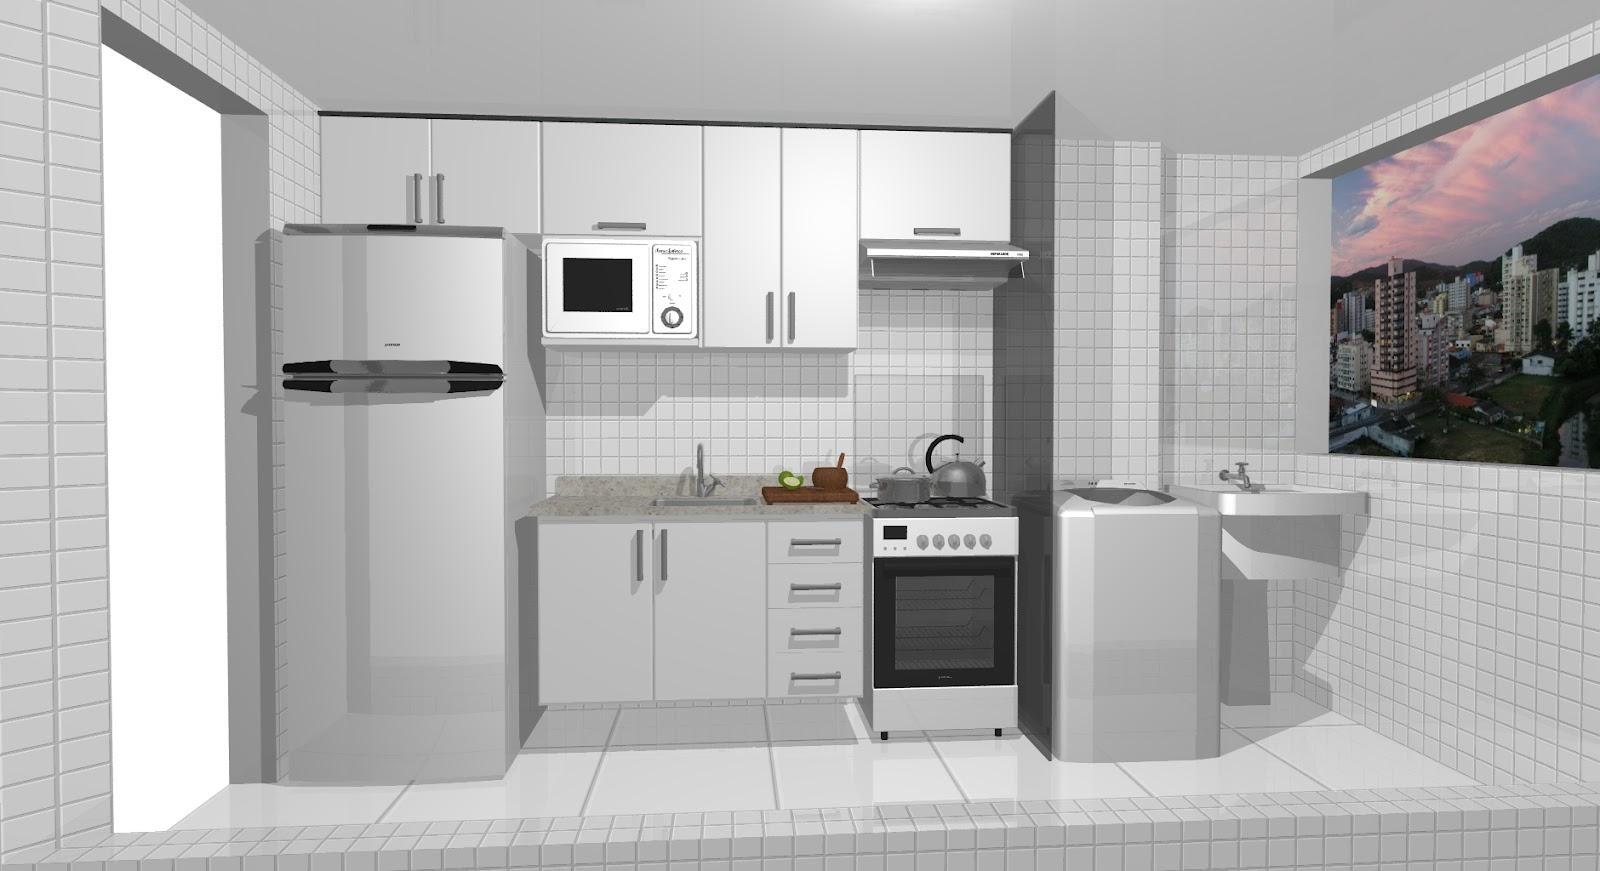 armarios cozinha casas bahia Quotes #5B4538 1600 871